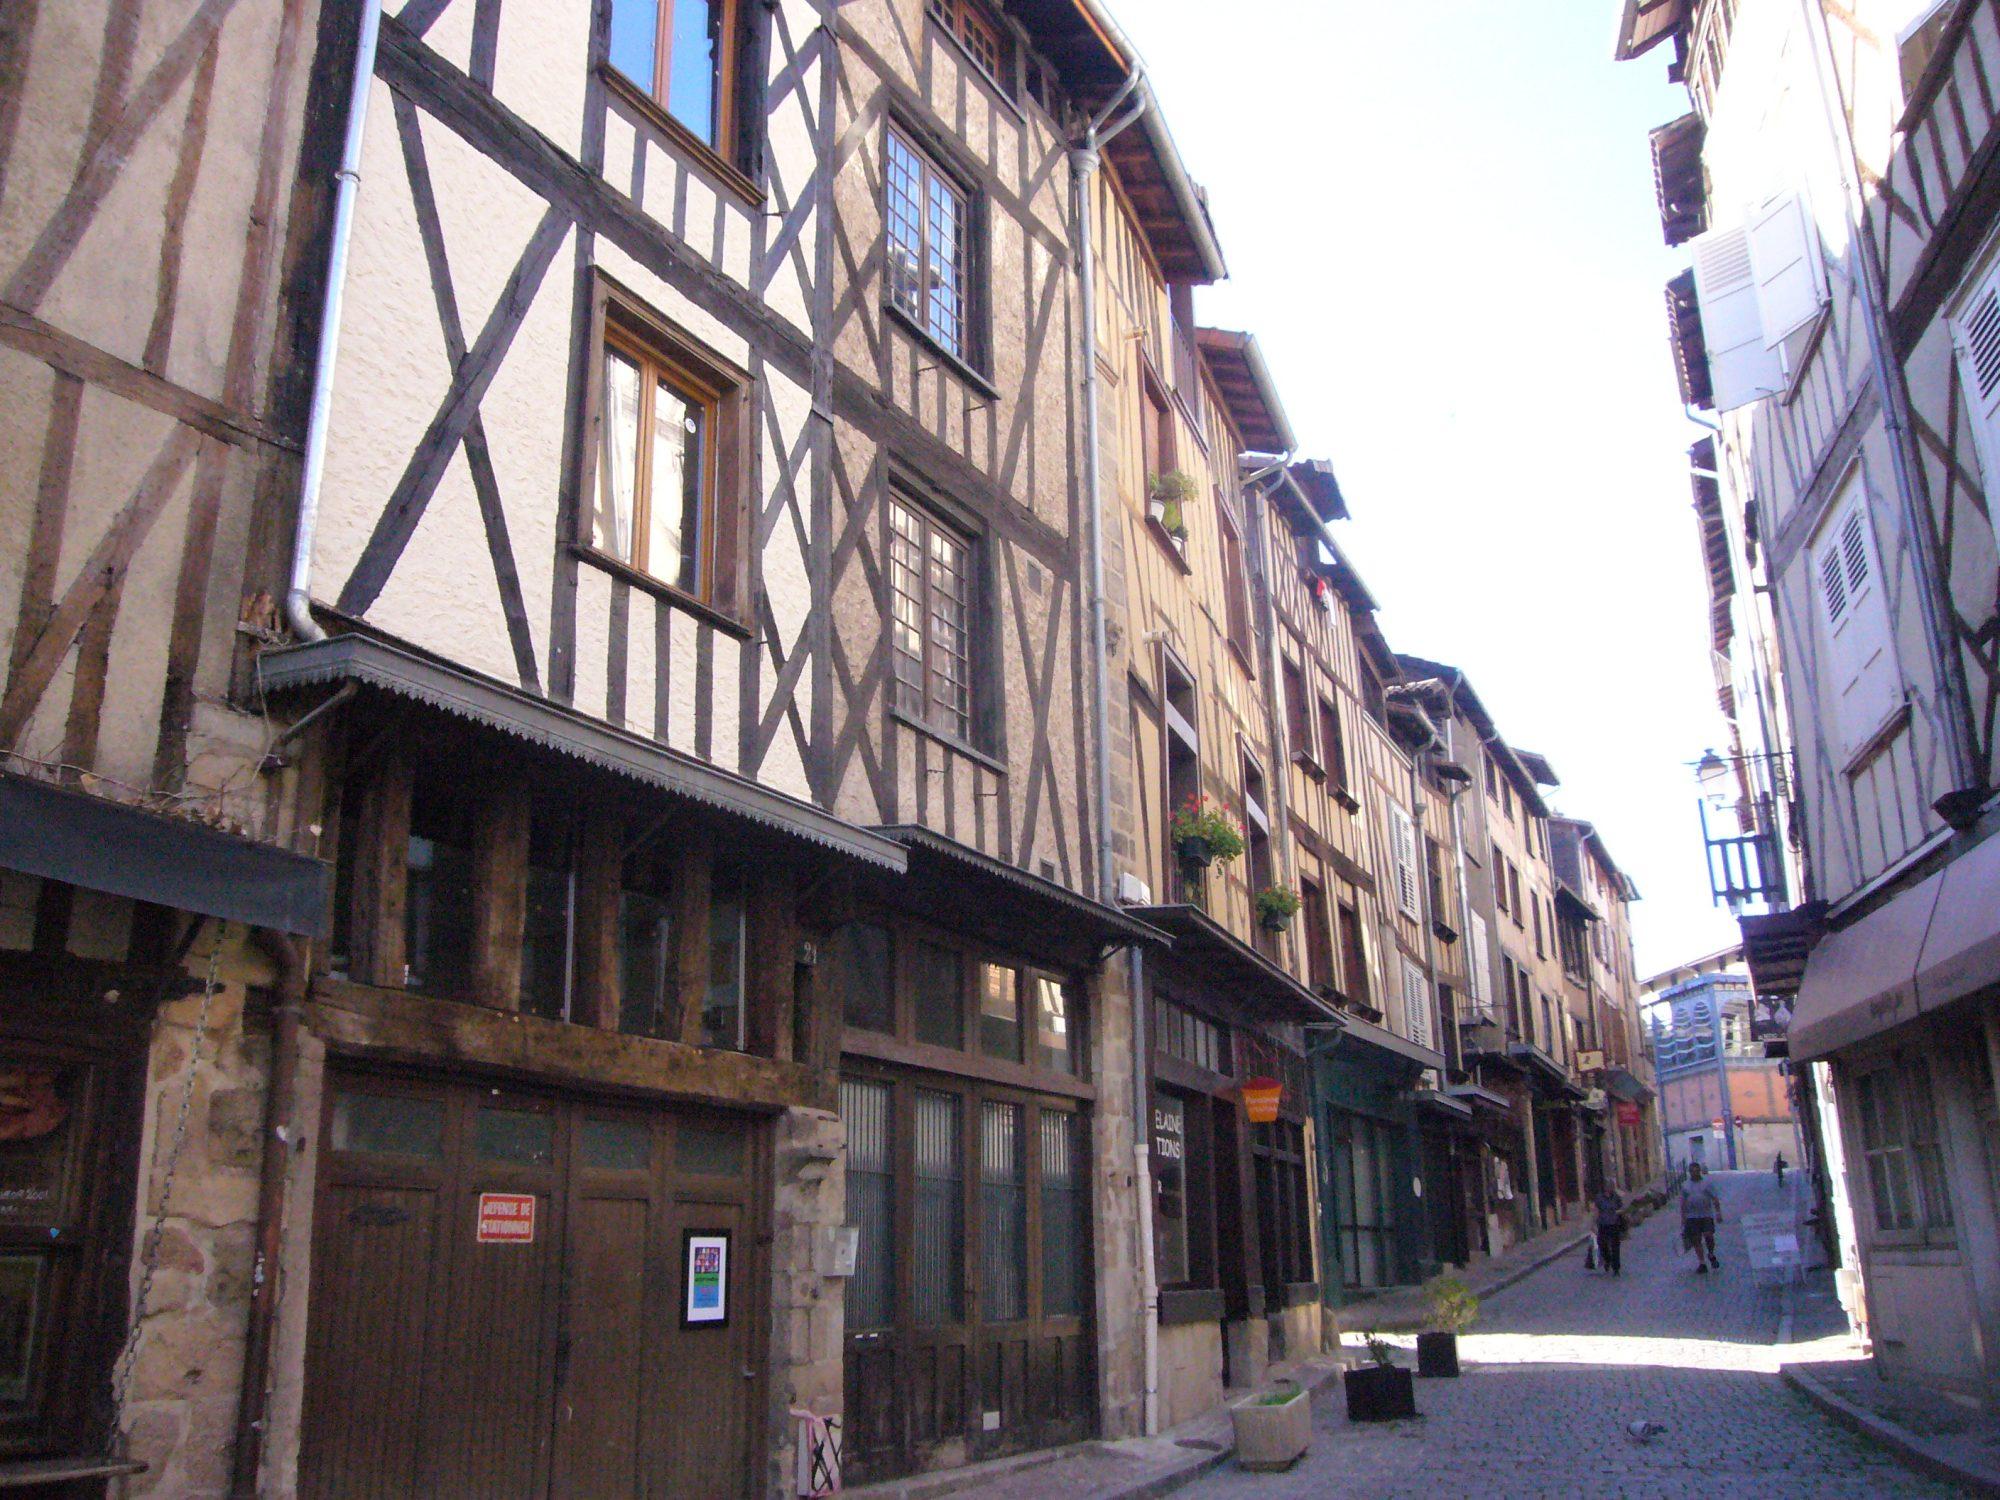 Boucherie Limoges